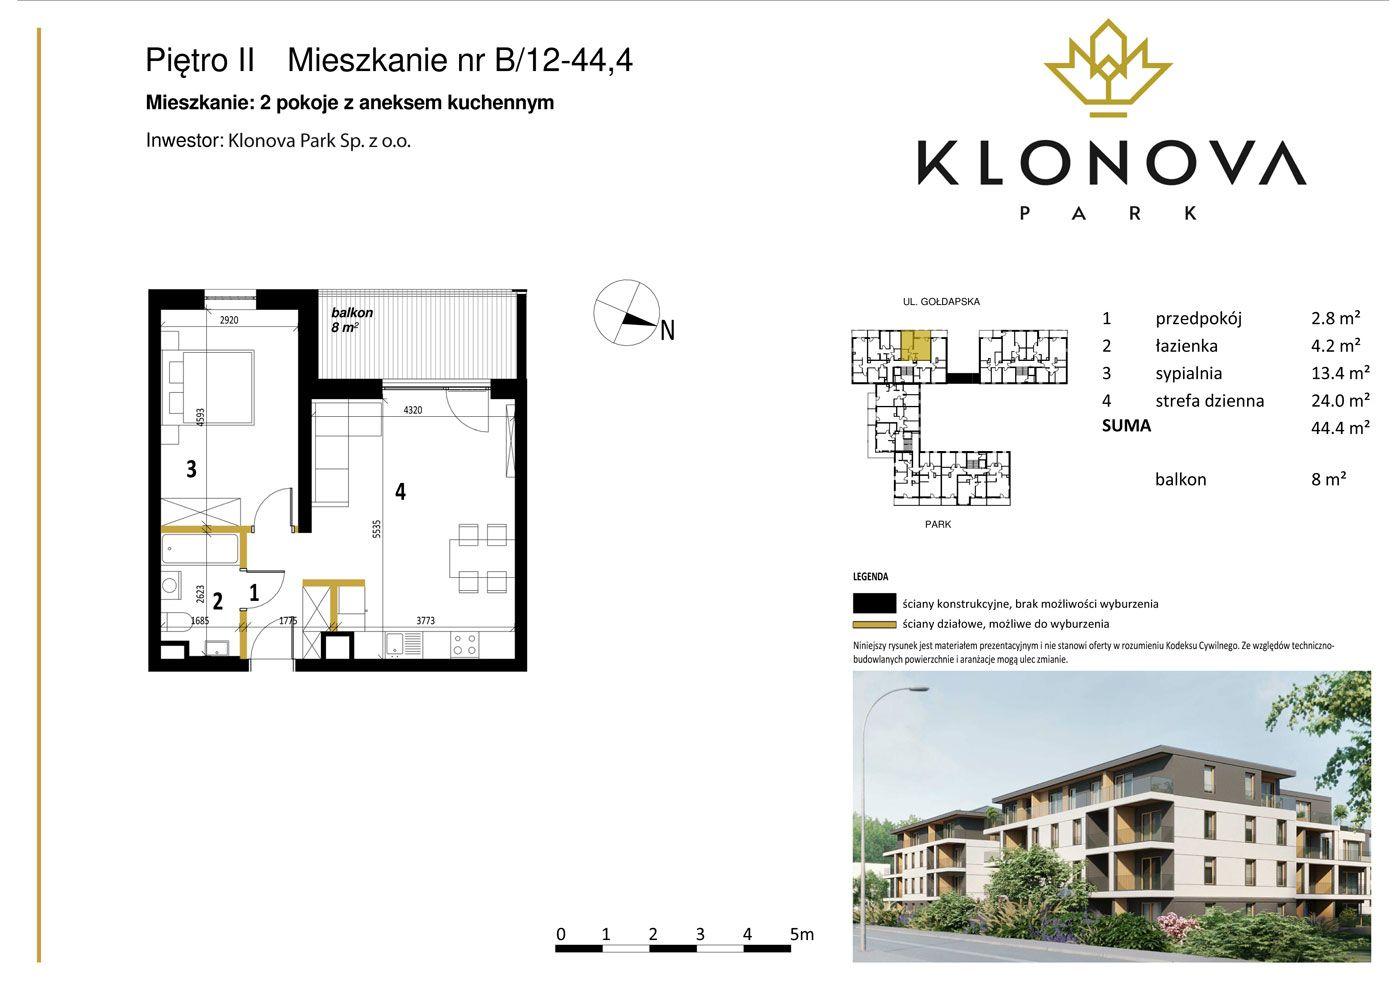 Apartamenty Klonova Park - Plan mieszkania B/12